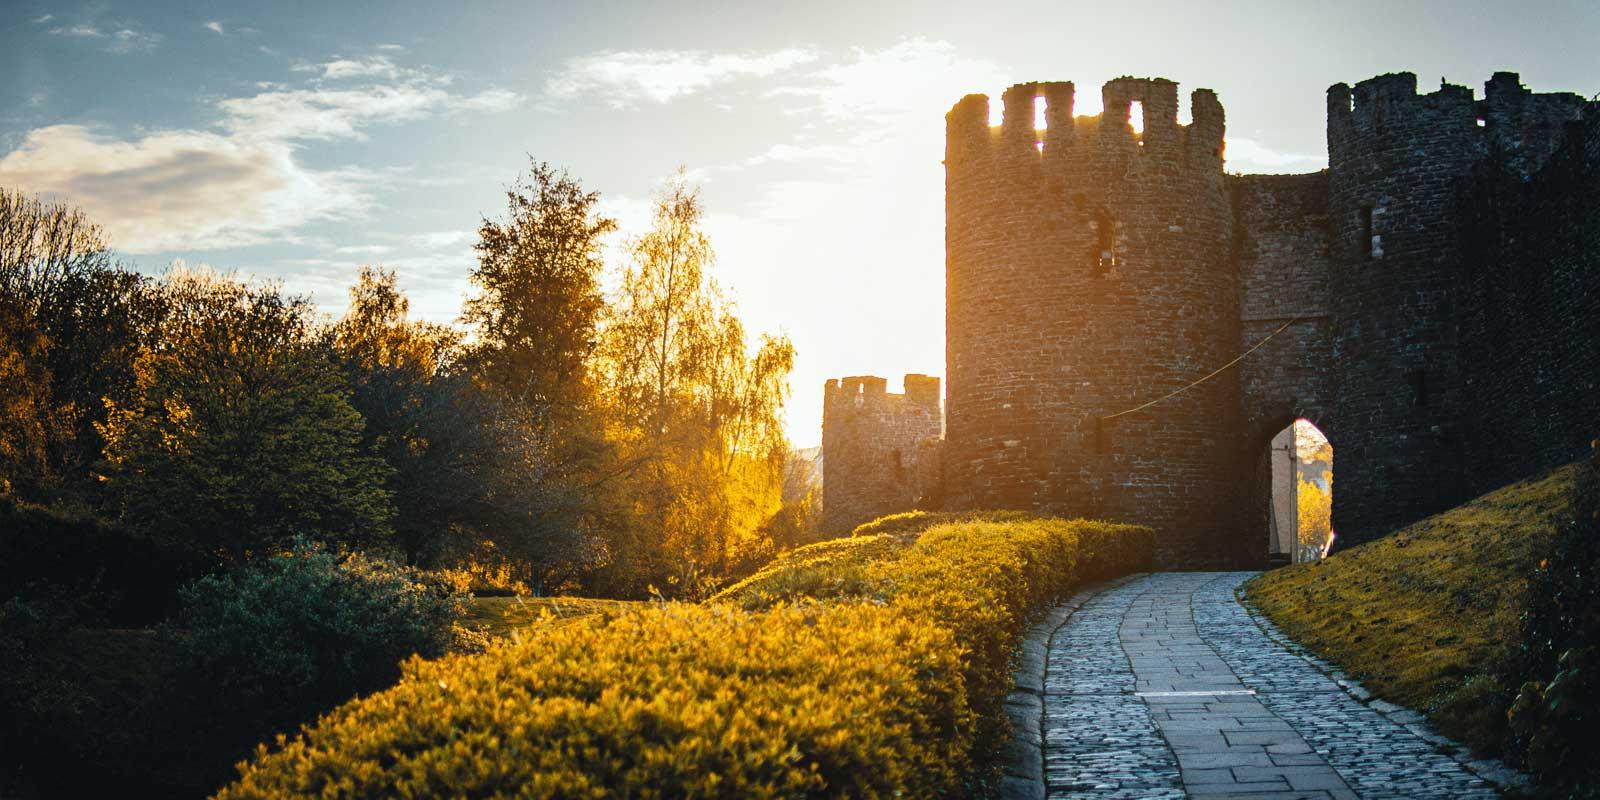 Castles & Gardens Train Journeys